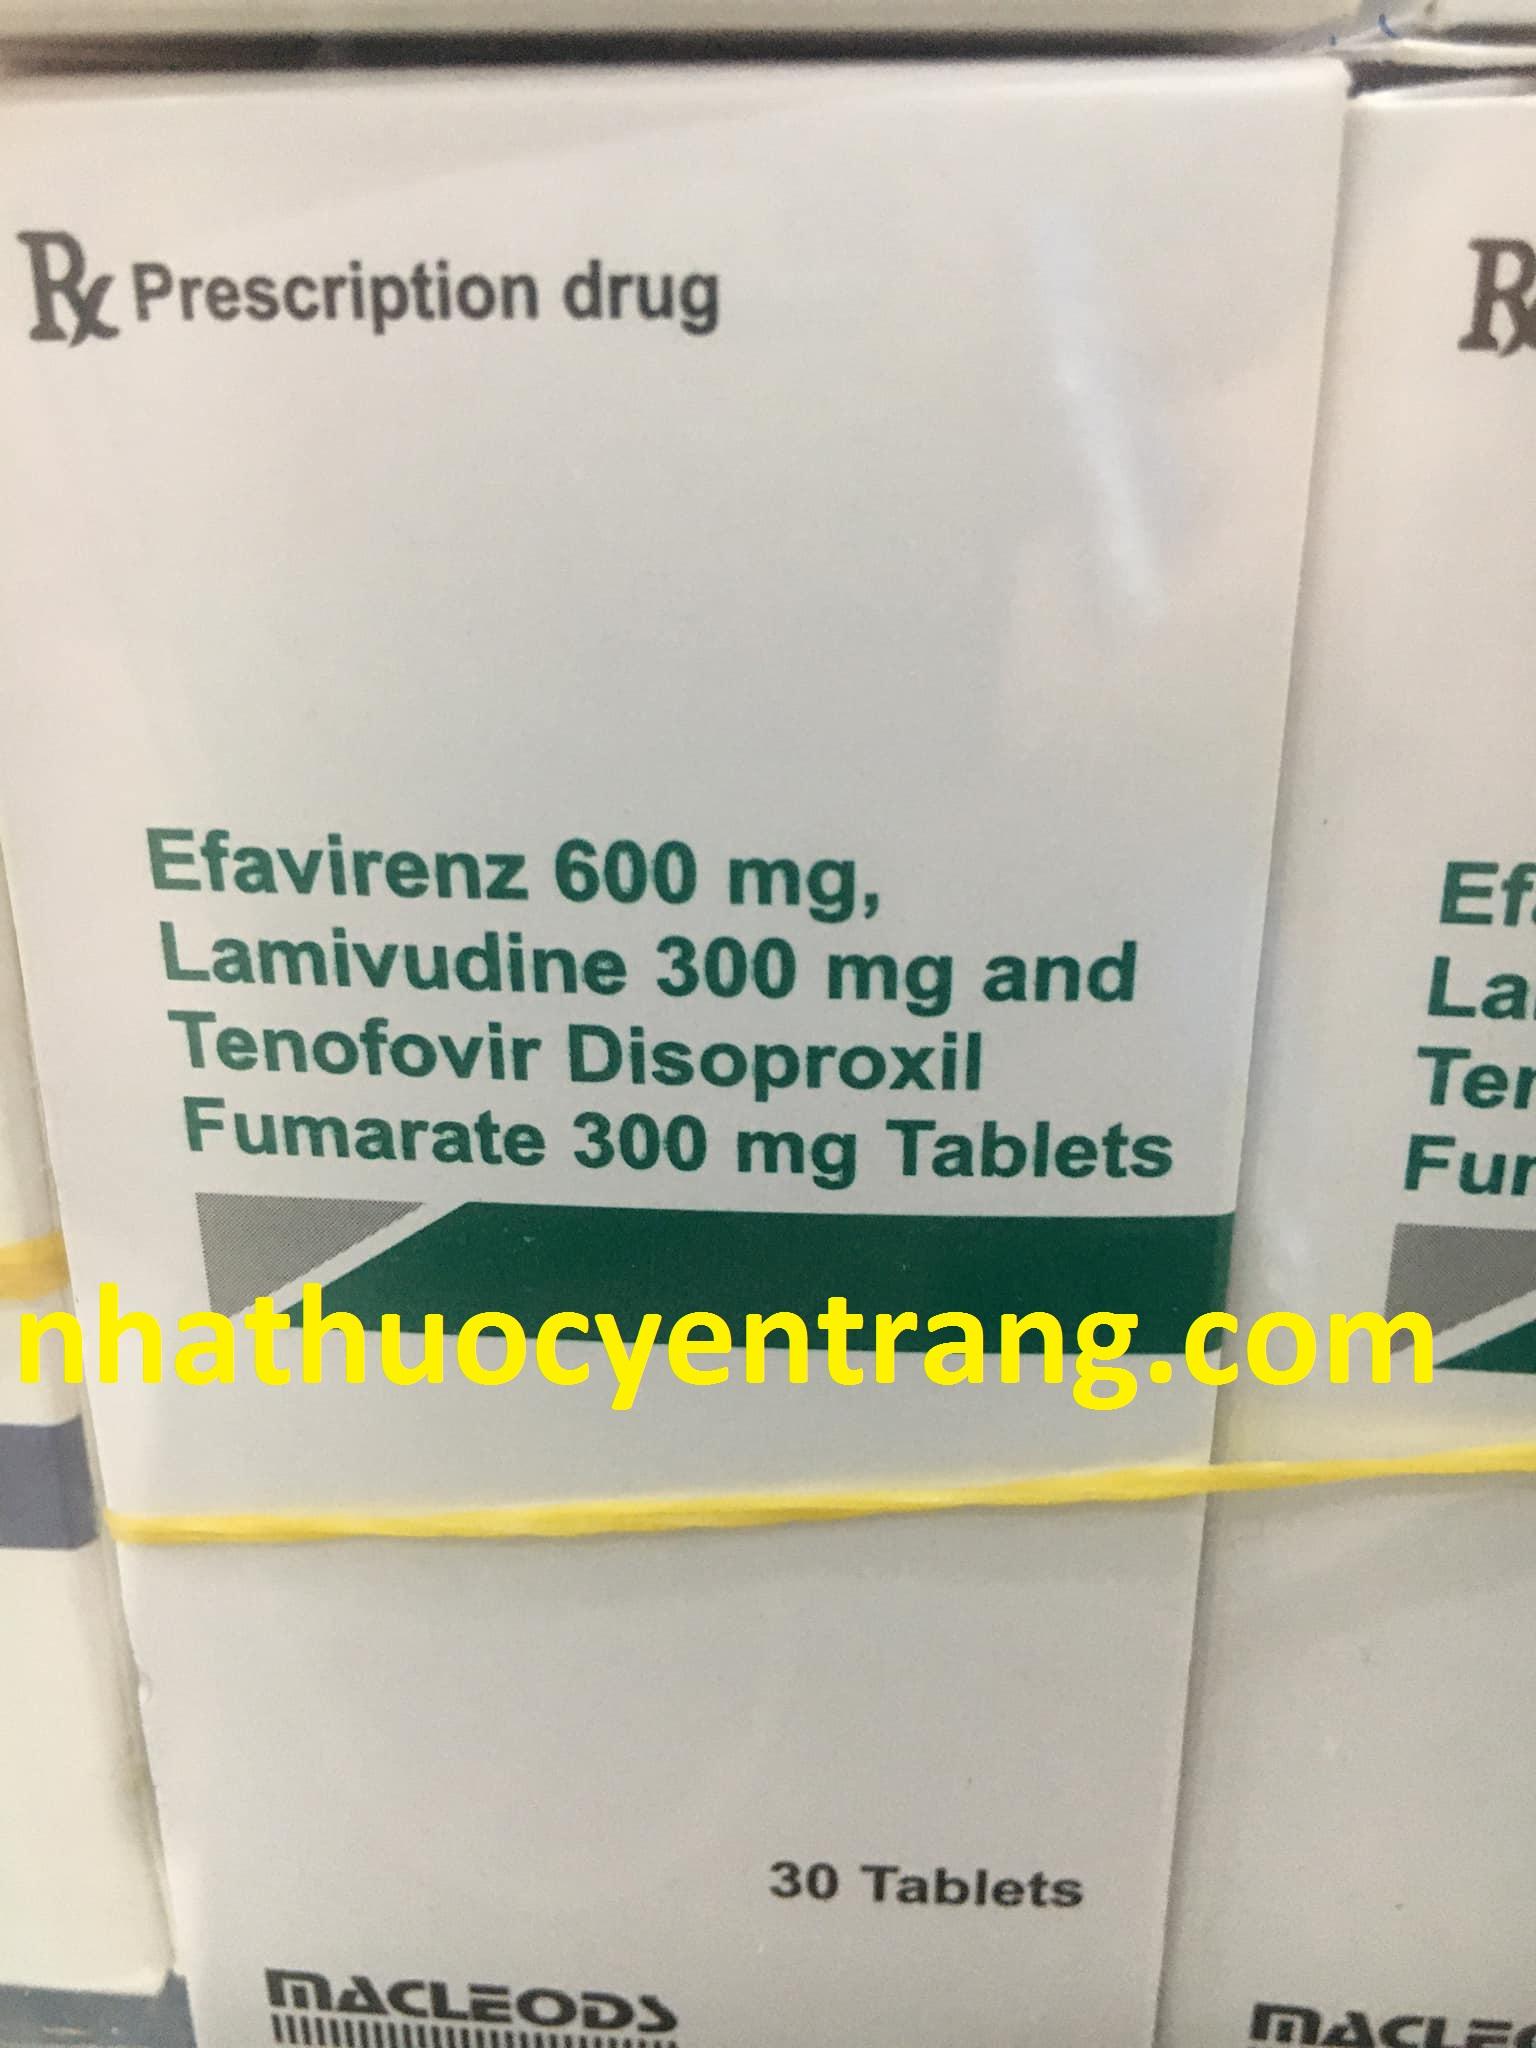 Efavirenz 600mg, Lamivudine 300mg and Tenofovir 300mg